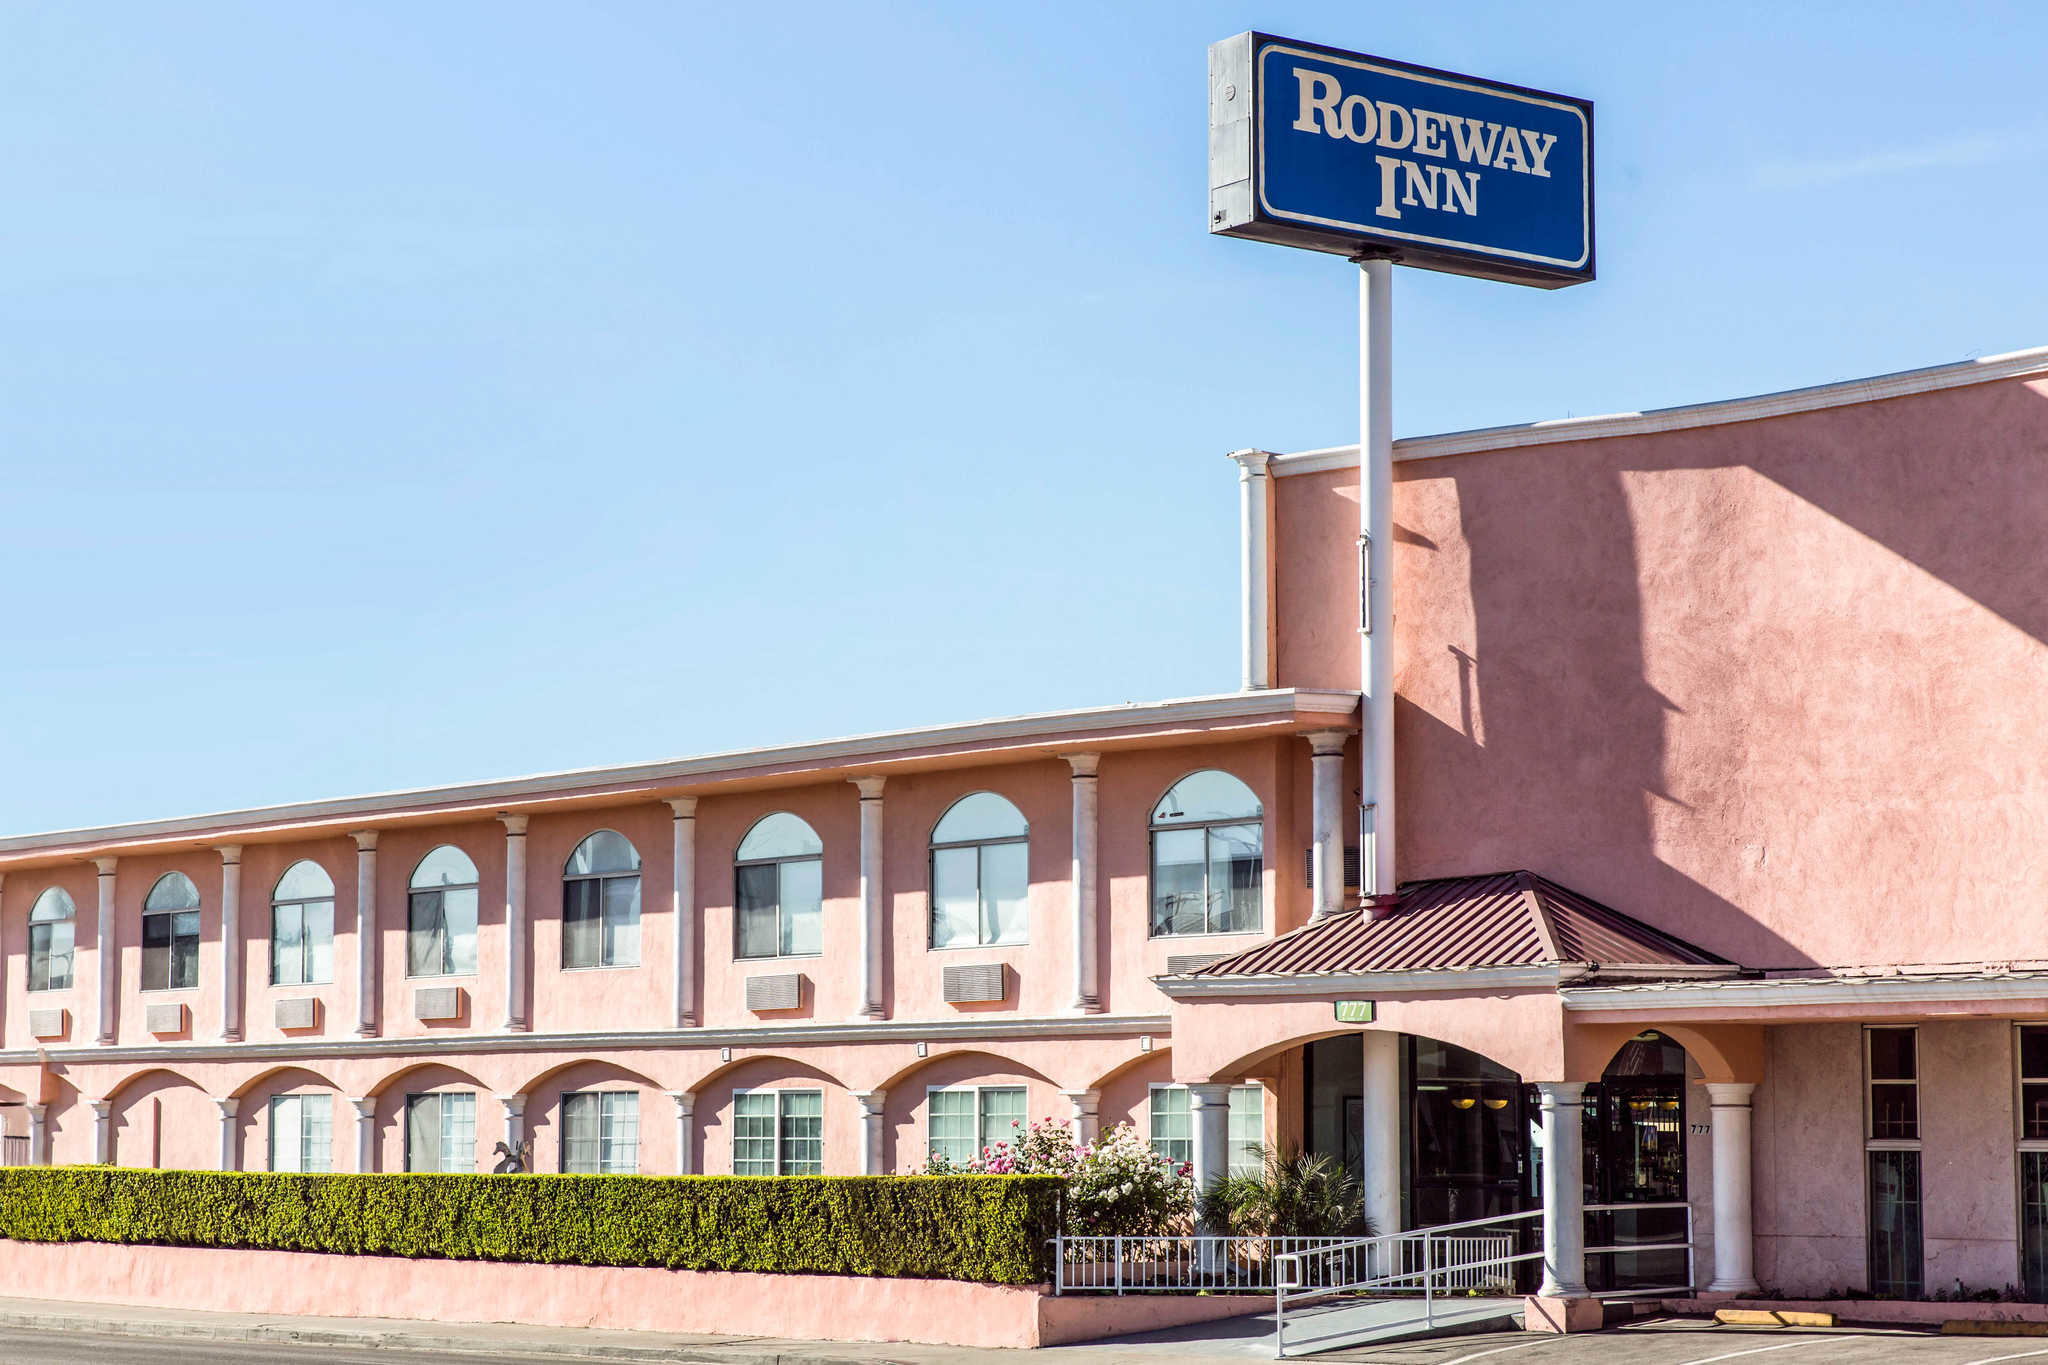 Rodeway Inn image 2